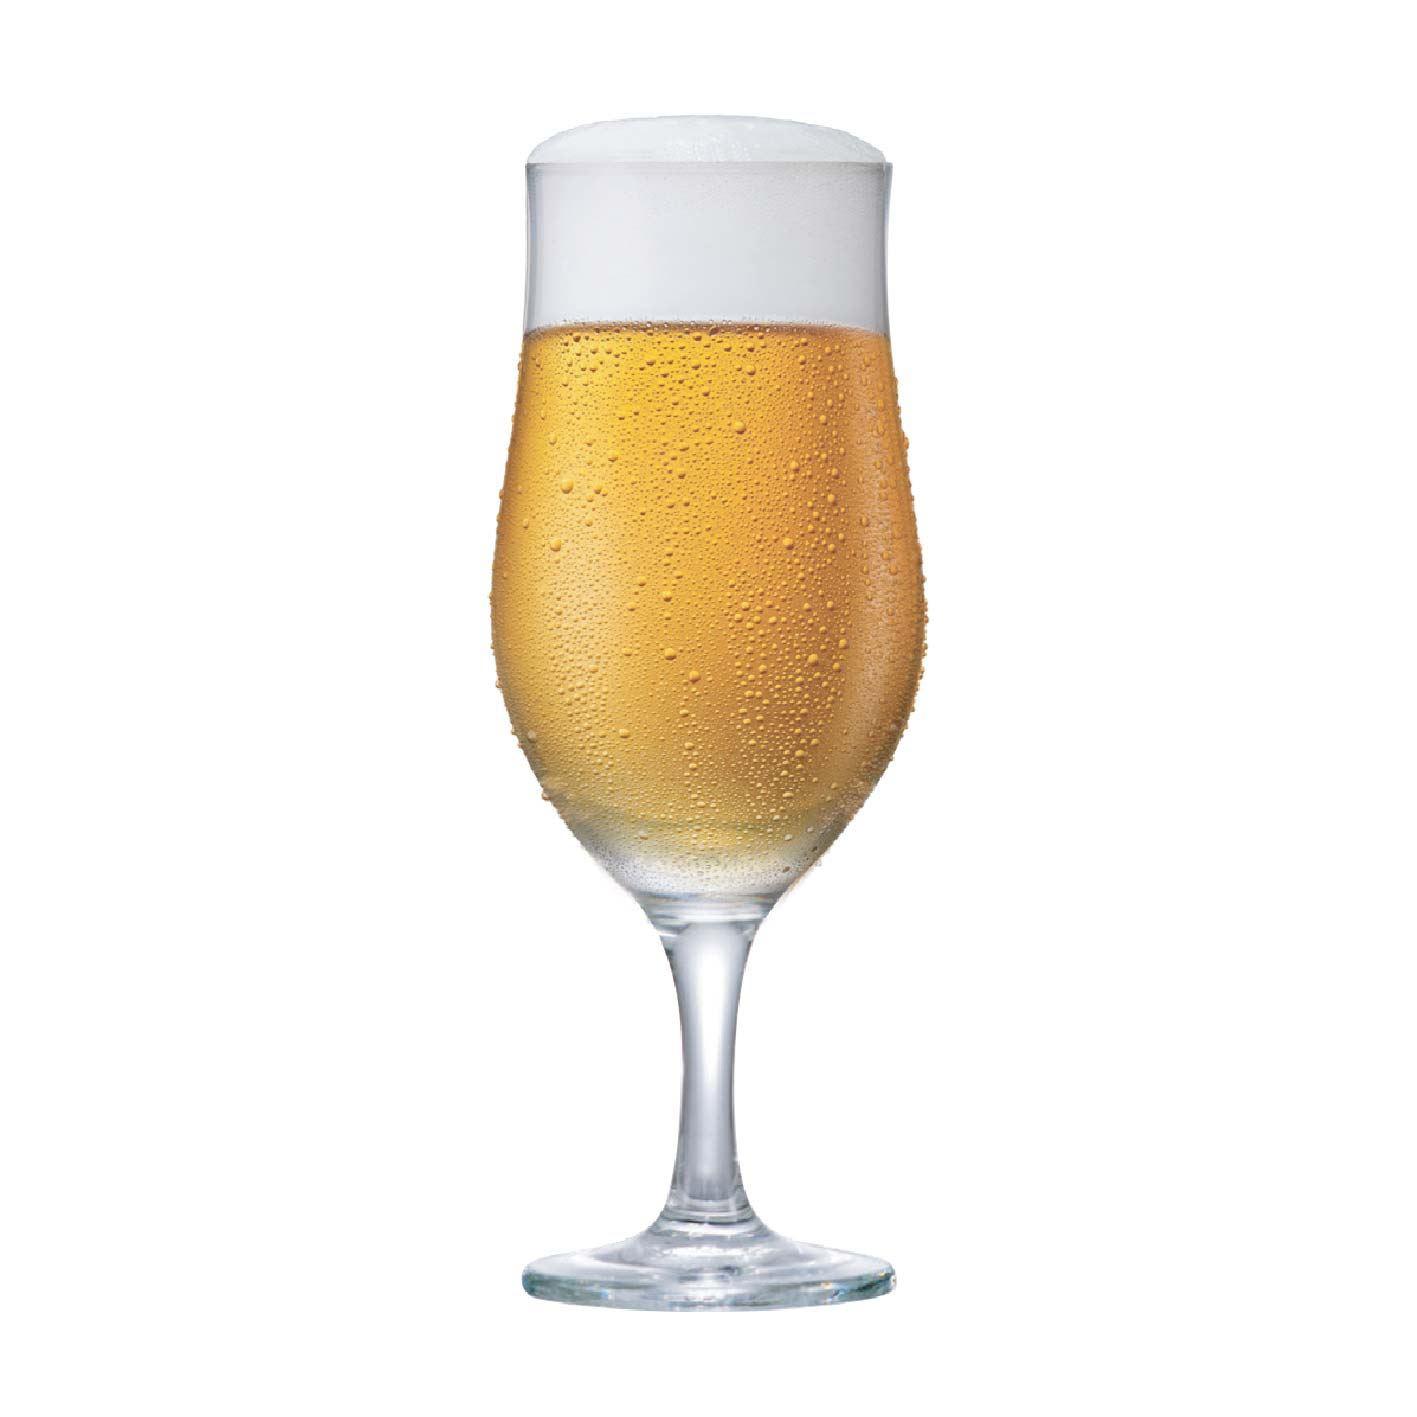 Jogo de Taças para Cerveja Rótulo Berlin 330ml 6 Pcs